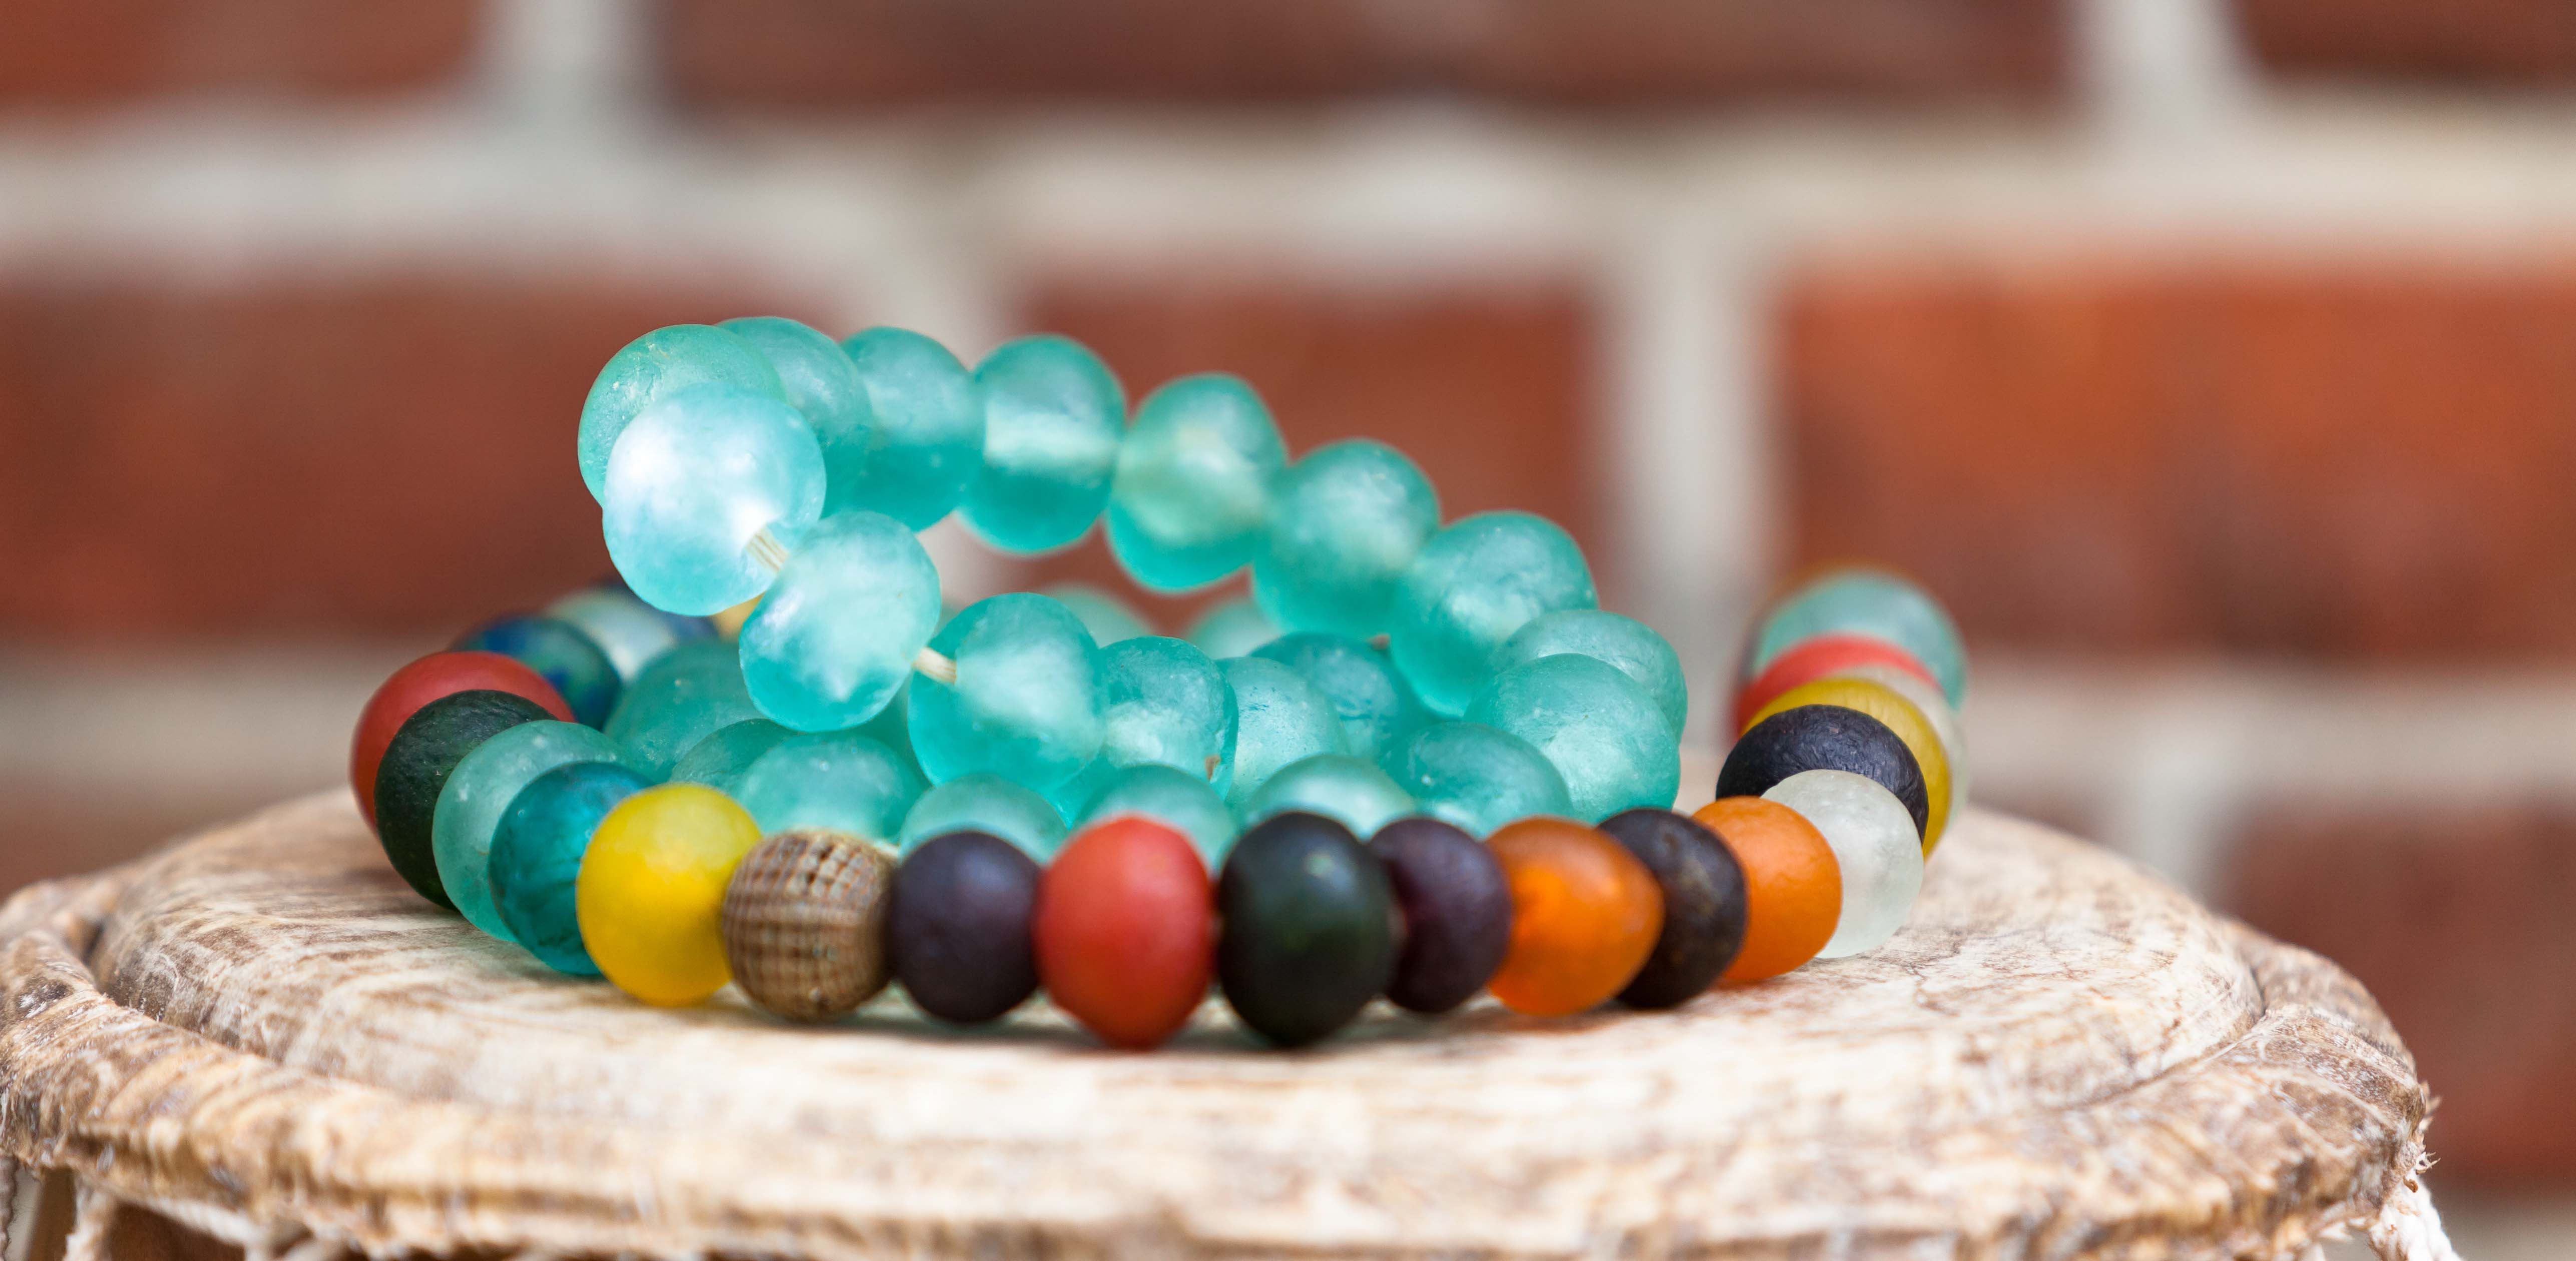 Afrikanisches Glasperlenfest in Großharrie mit Perlenmacher Oklah Teethe aus Ghana